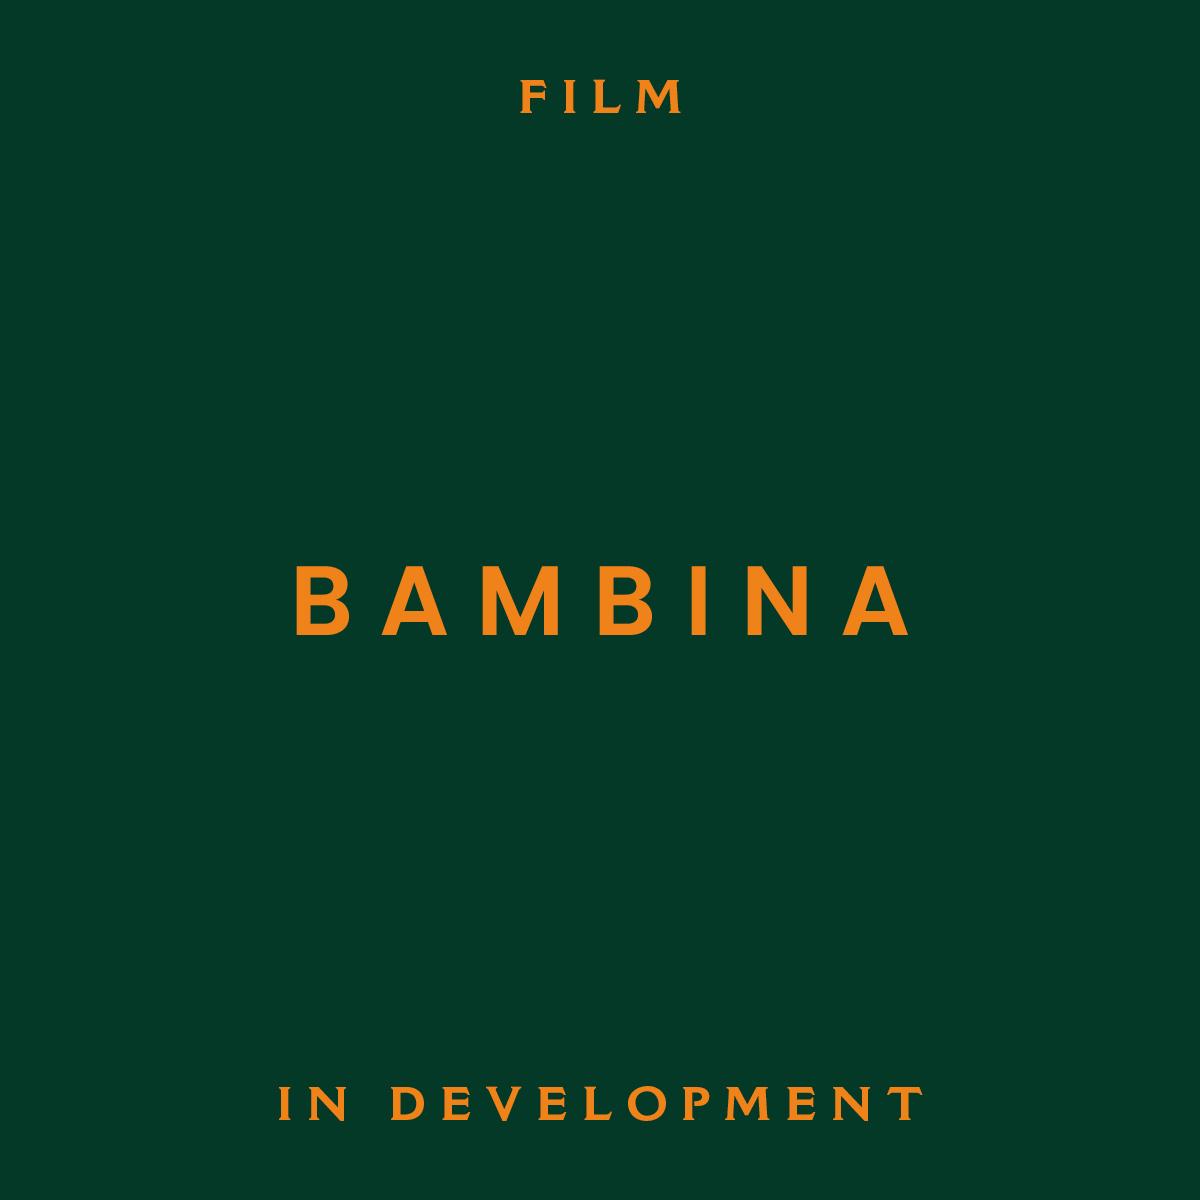 bambina, film, in development, Kate cox